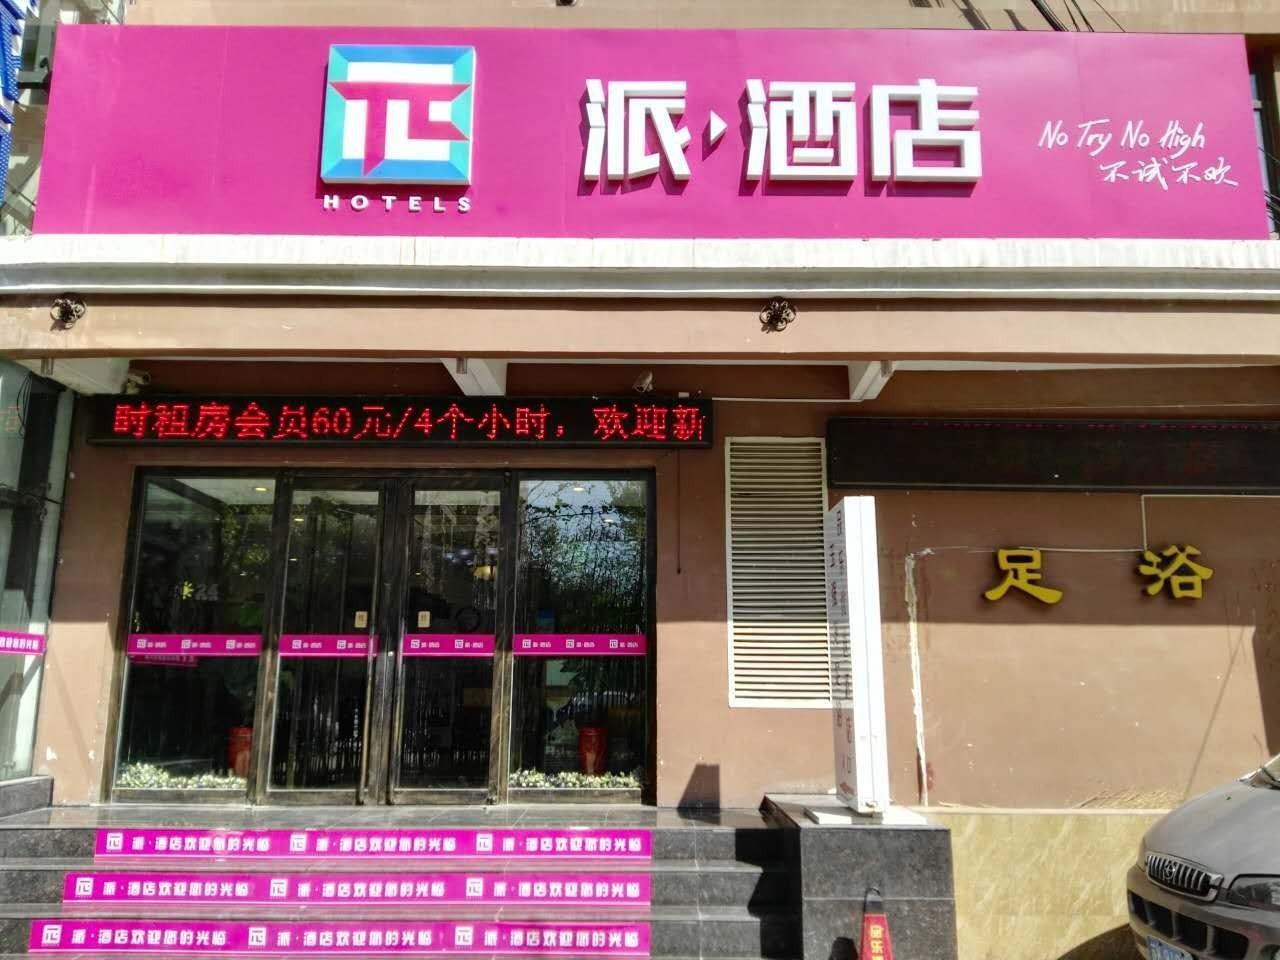 Pai Hotel Shijiazhuang Seaview Avenue   formerlyly Pinyue Hotel